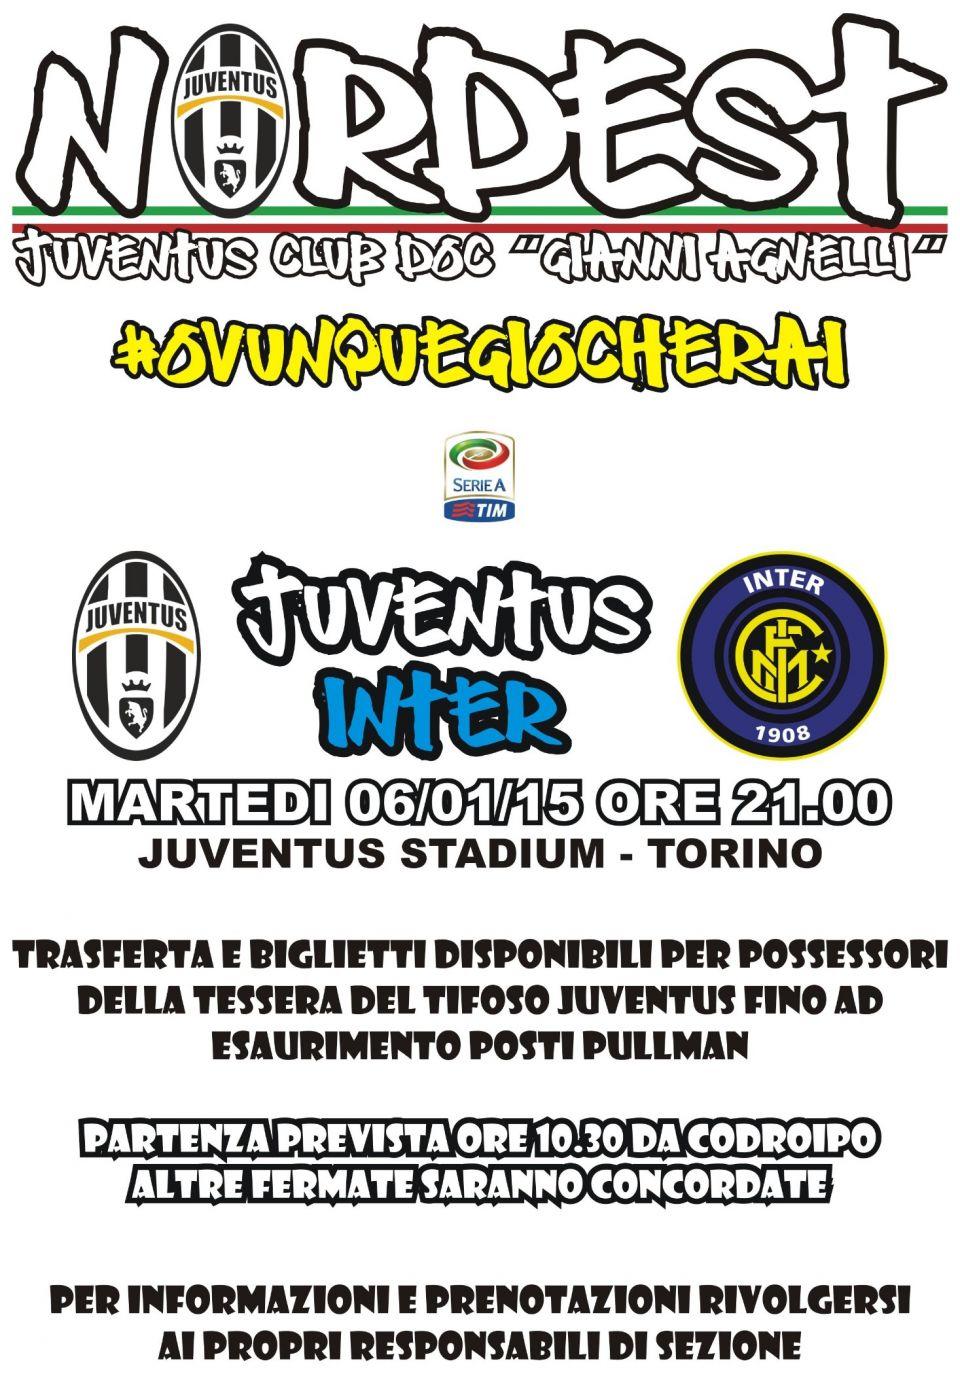 Juve - Inter 2015